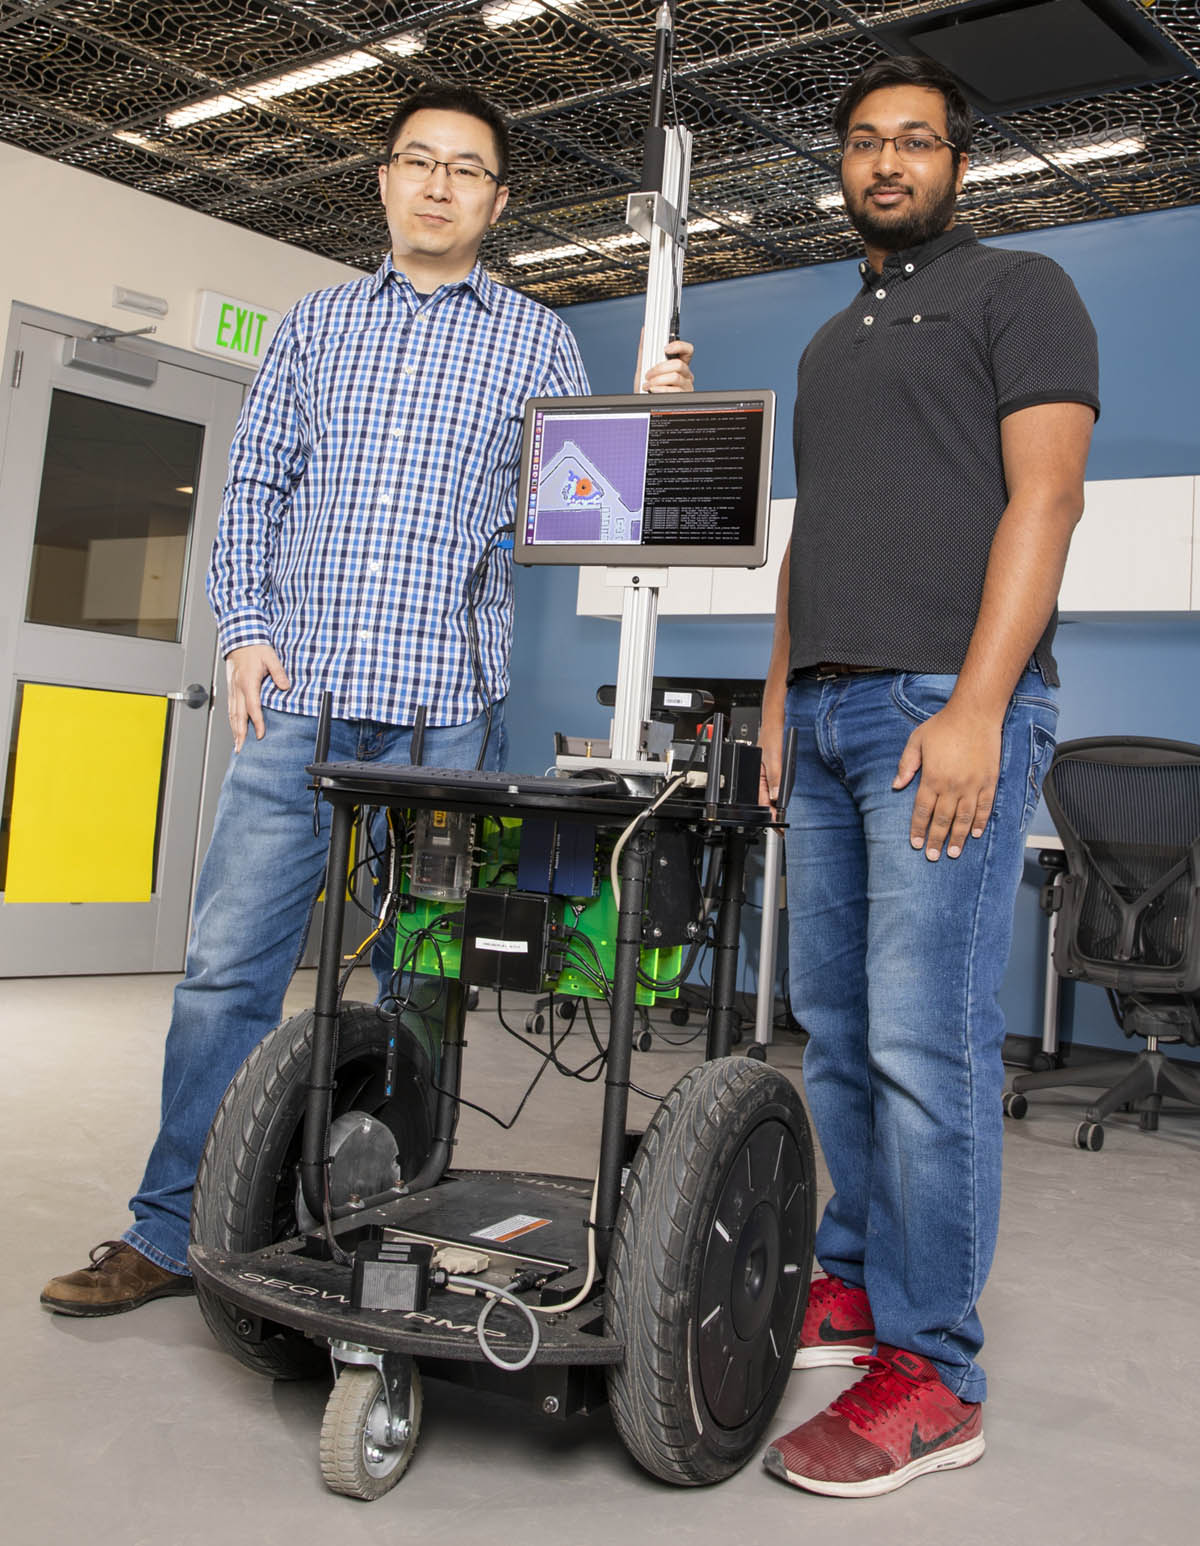 Assistant Professor Shiqi Zhang, left, and PhD student Kishan Chandan developed the ARROCH system alongside others at Zhang's Autonomous Intelligent Robotics Lab.